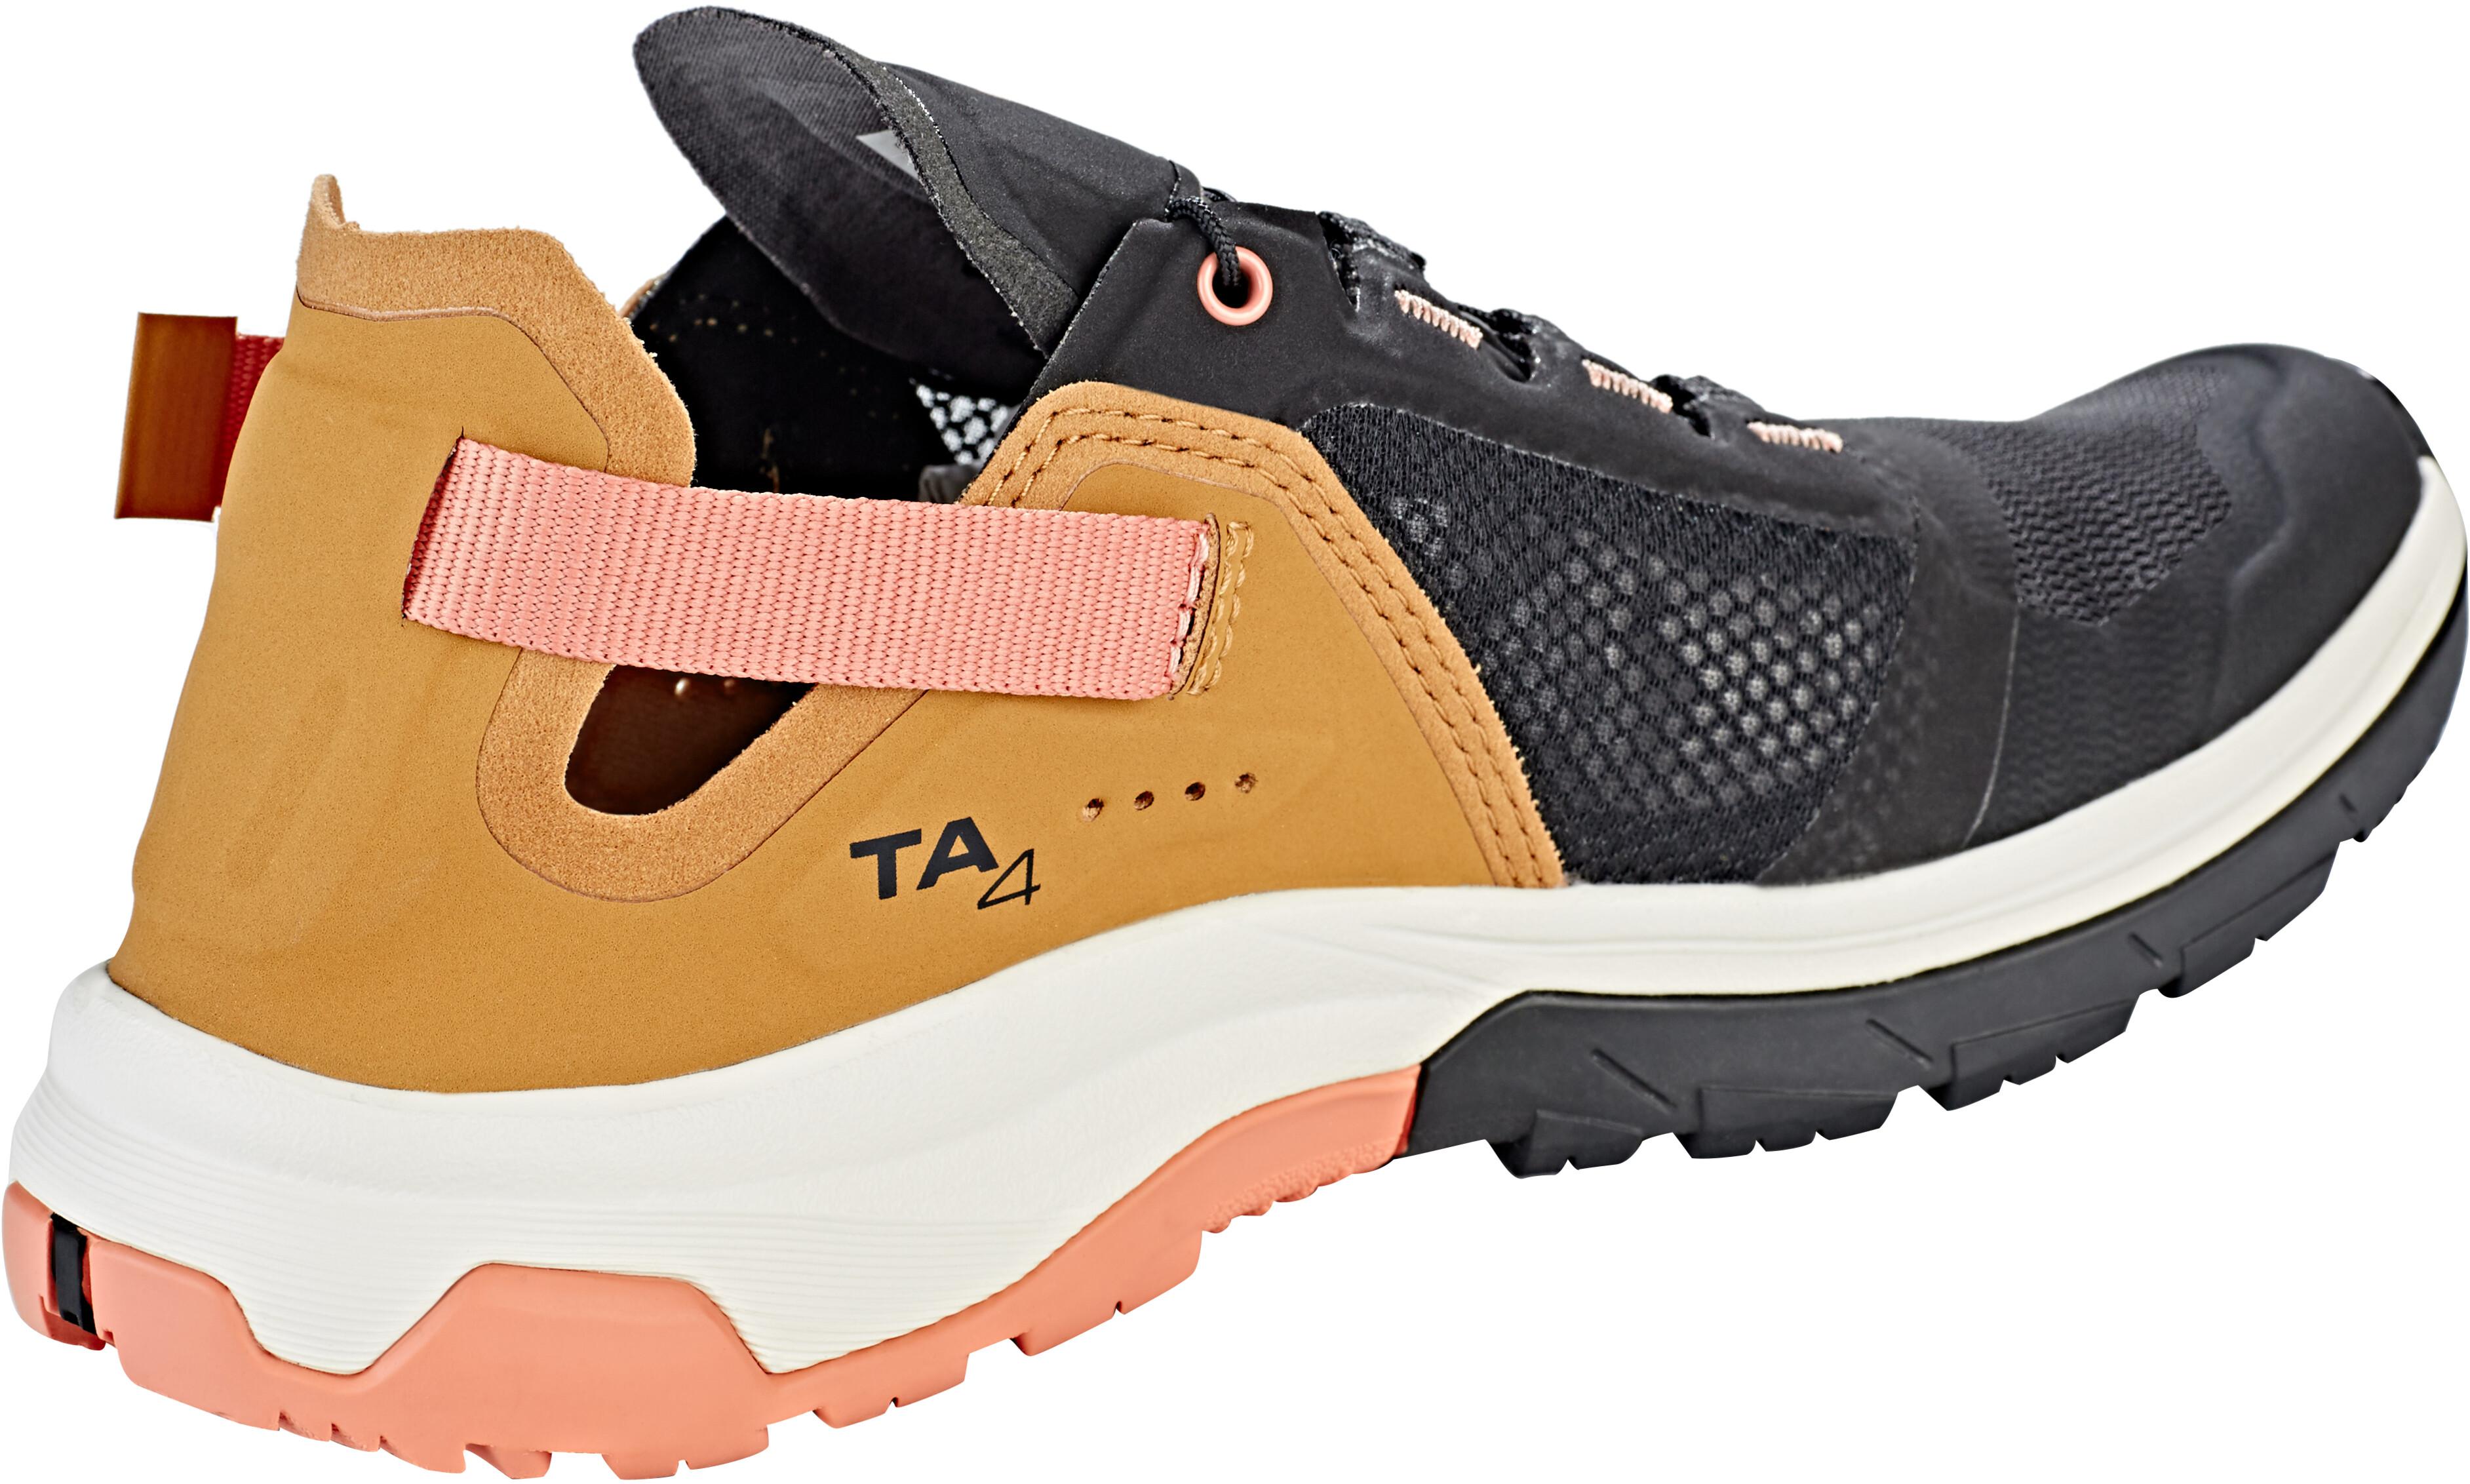 cd880491a Salomon Techamphibian 4 - Calzado Mujer - beige negro